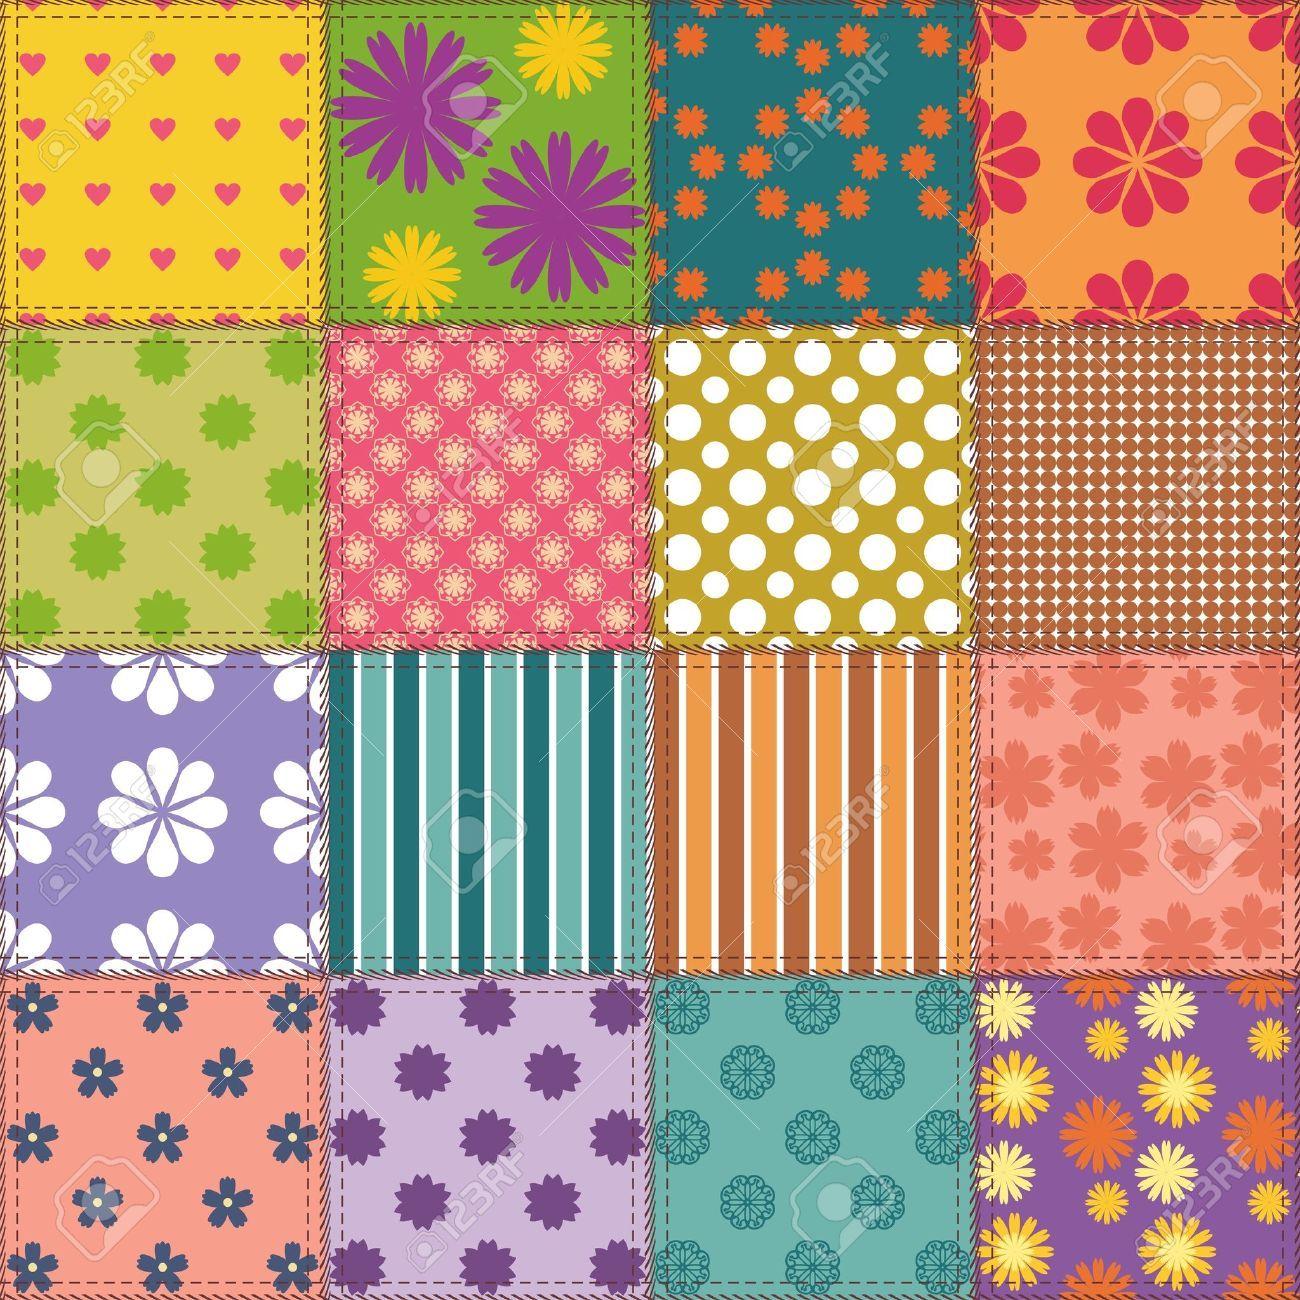 Quilt clipart quilt background. Patchwork x free clip